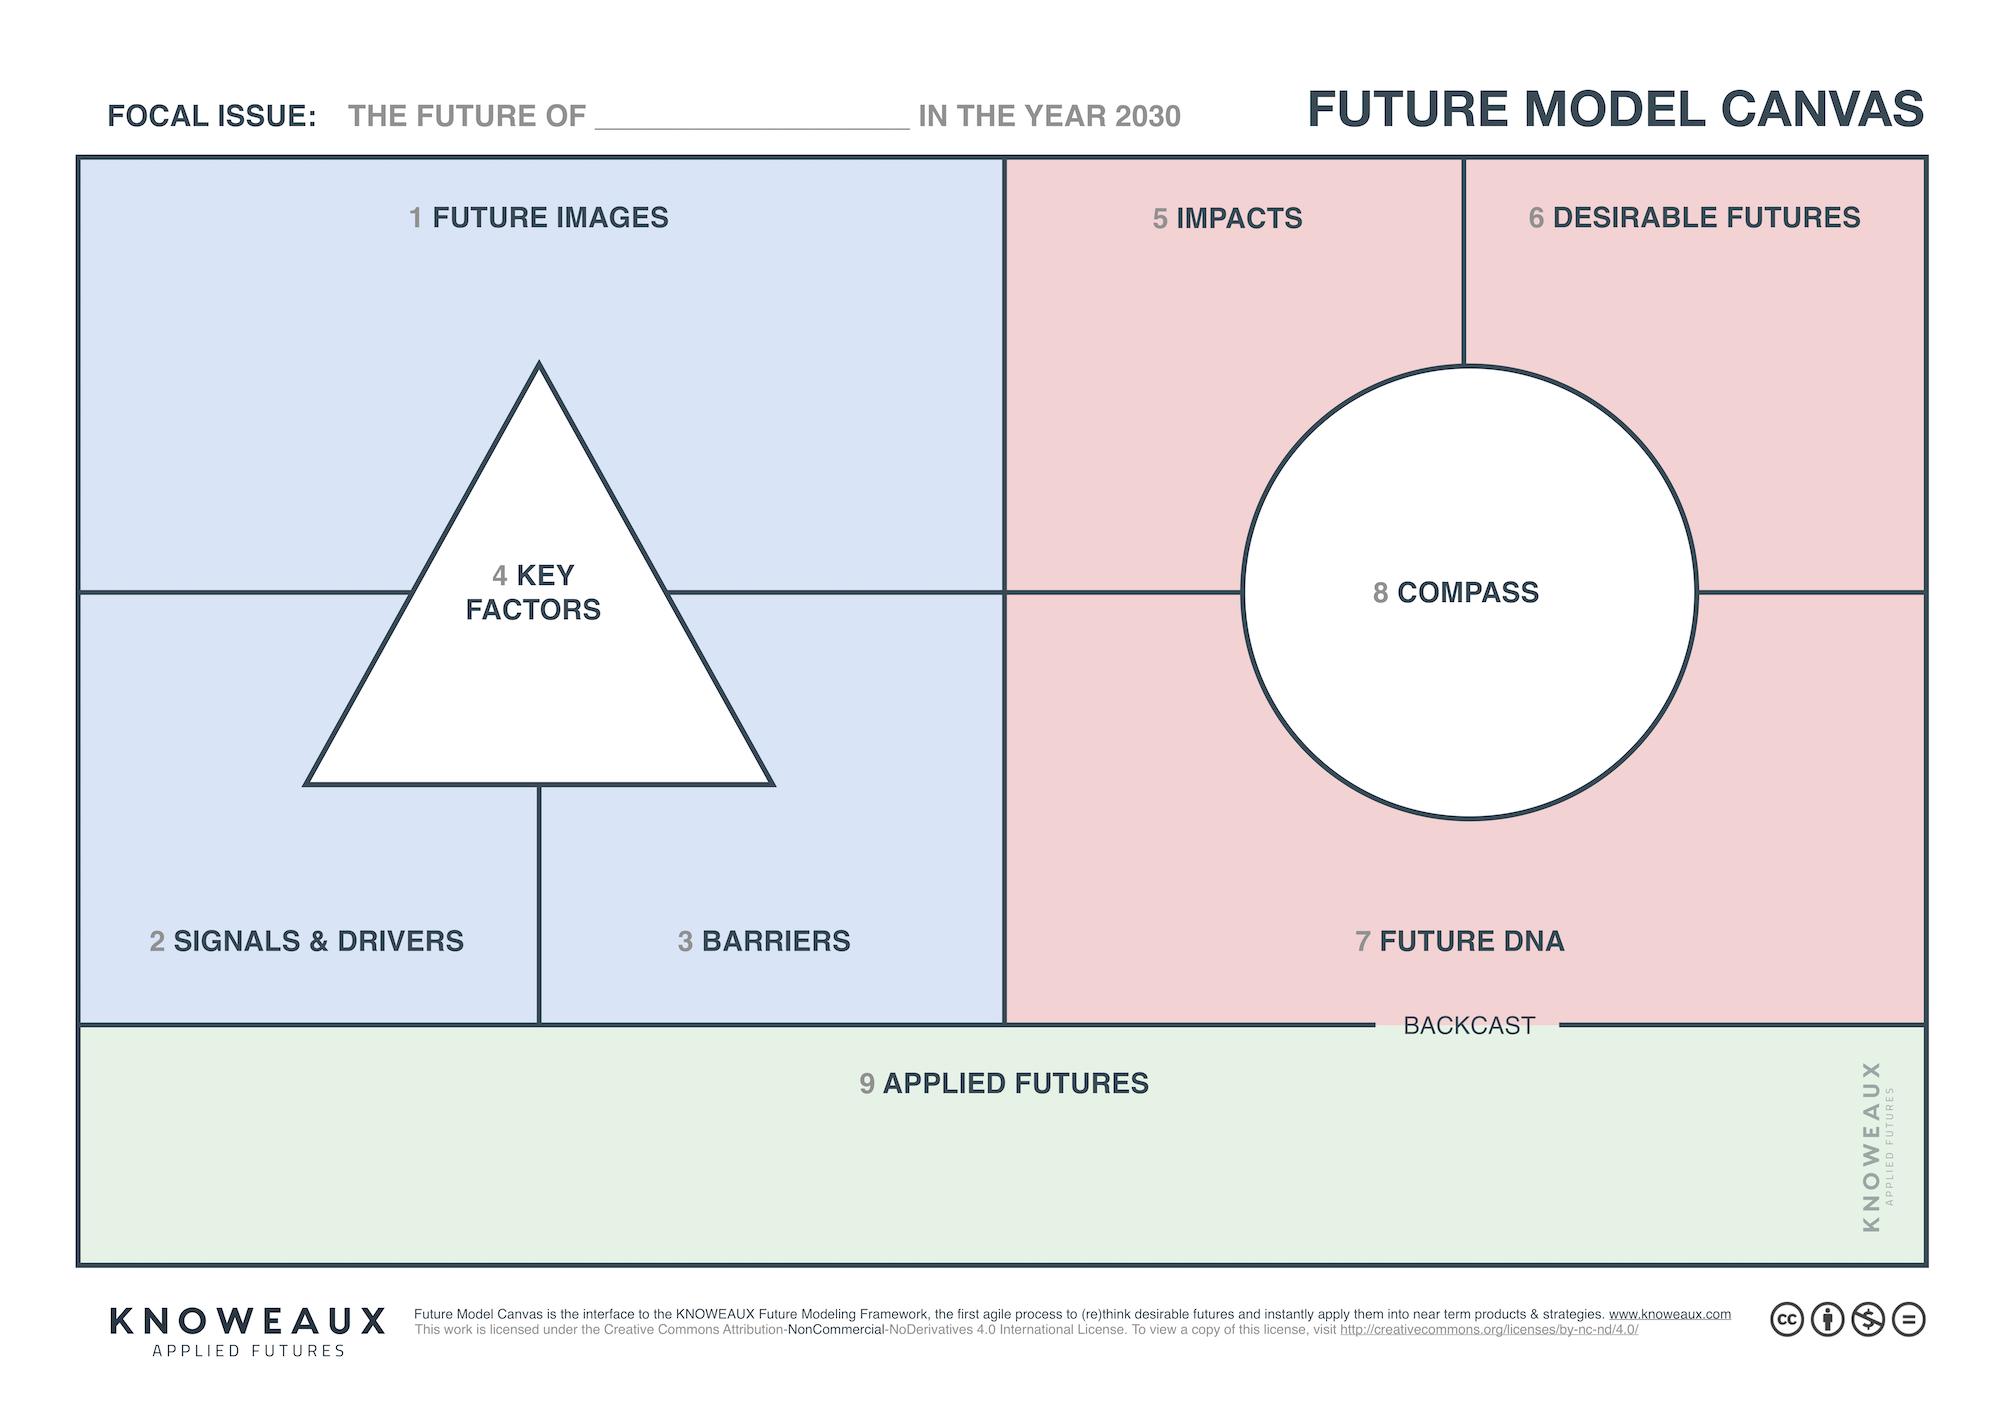 FutureModelCanvas_2.0.png